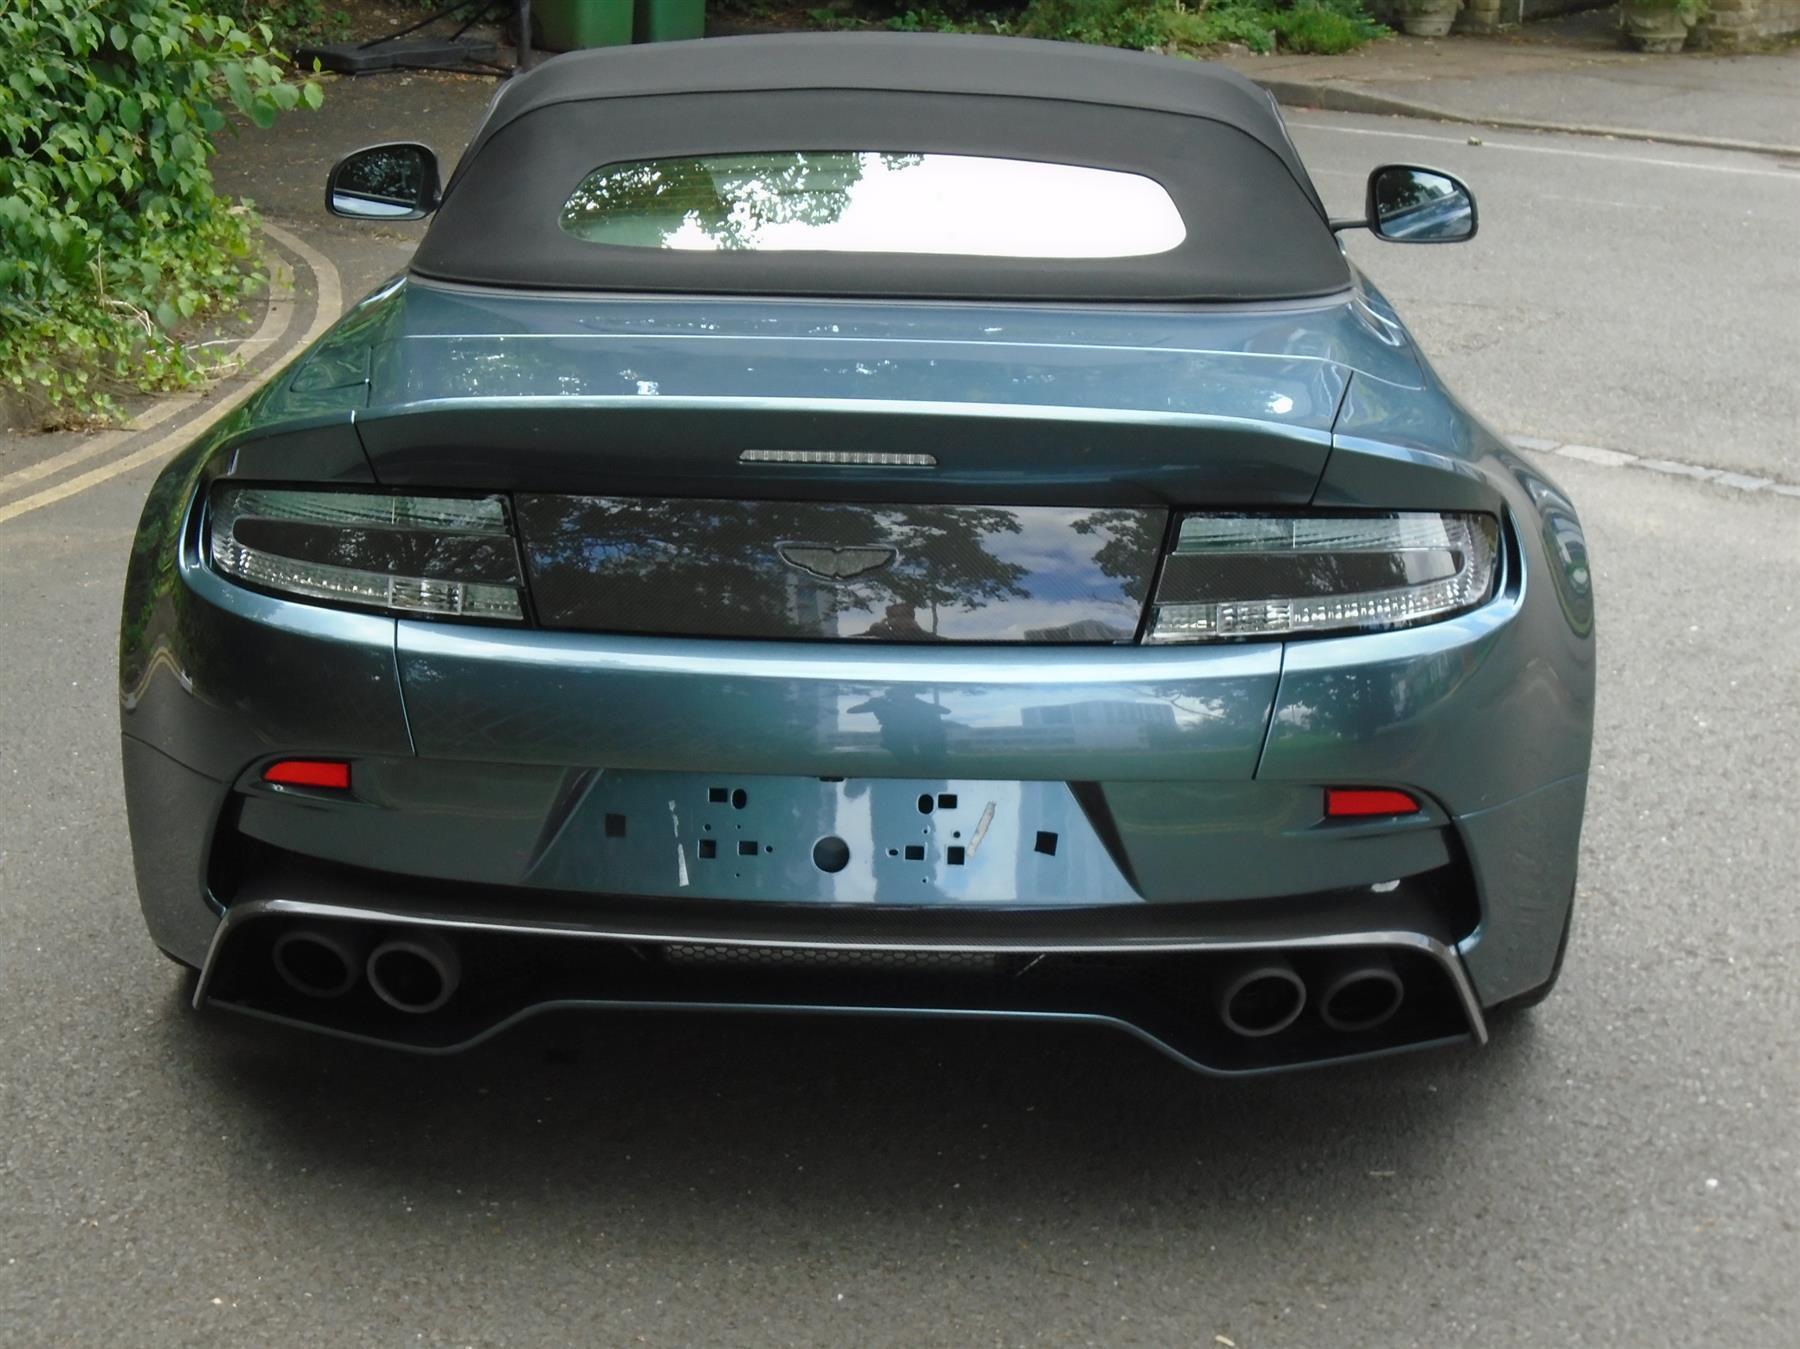 Aston_Martin_V12_Vantage_V600_Roadster_sale-0003